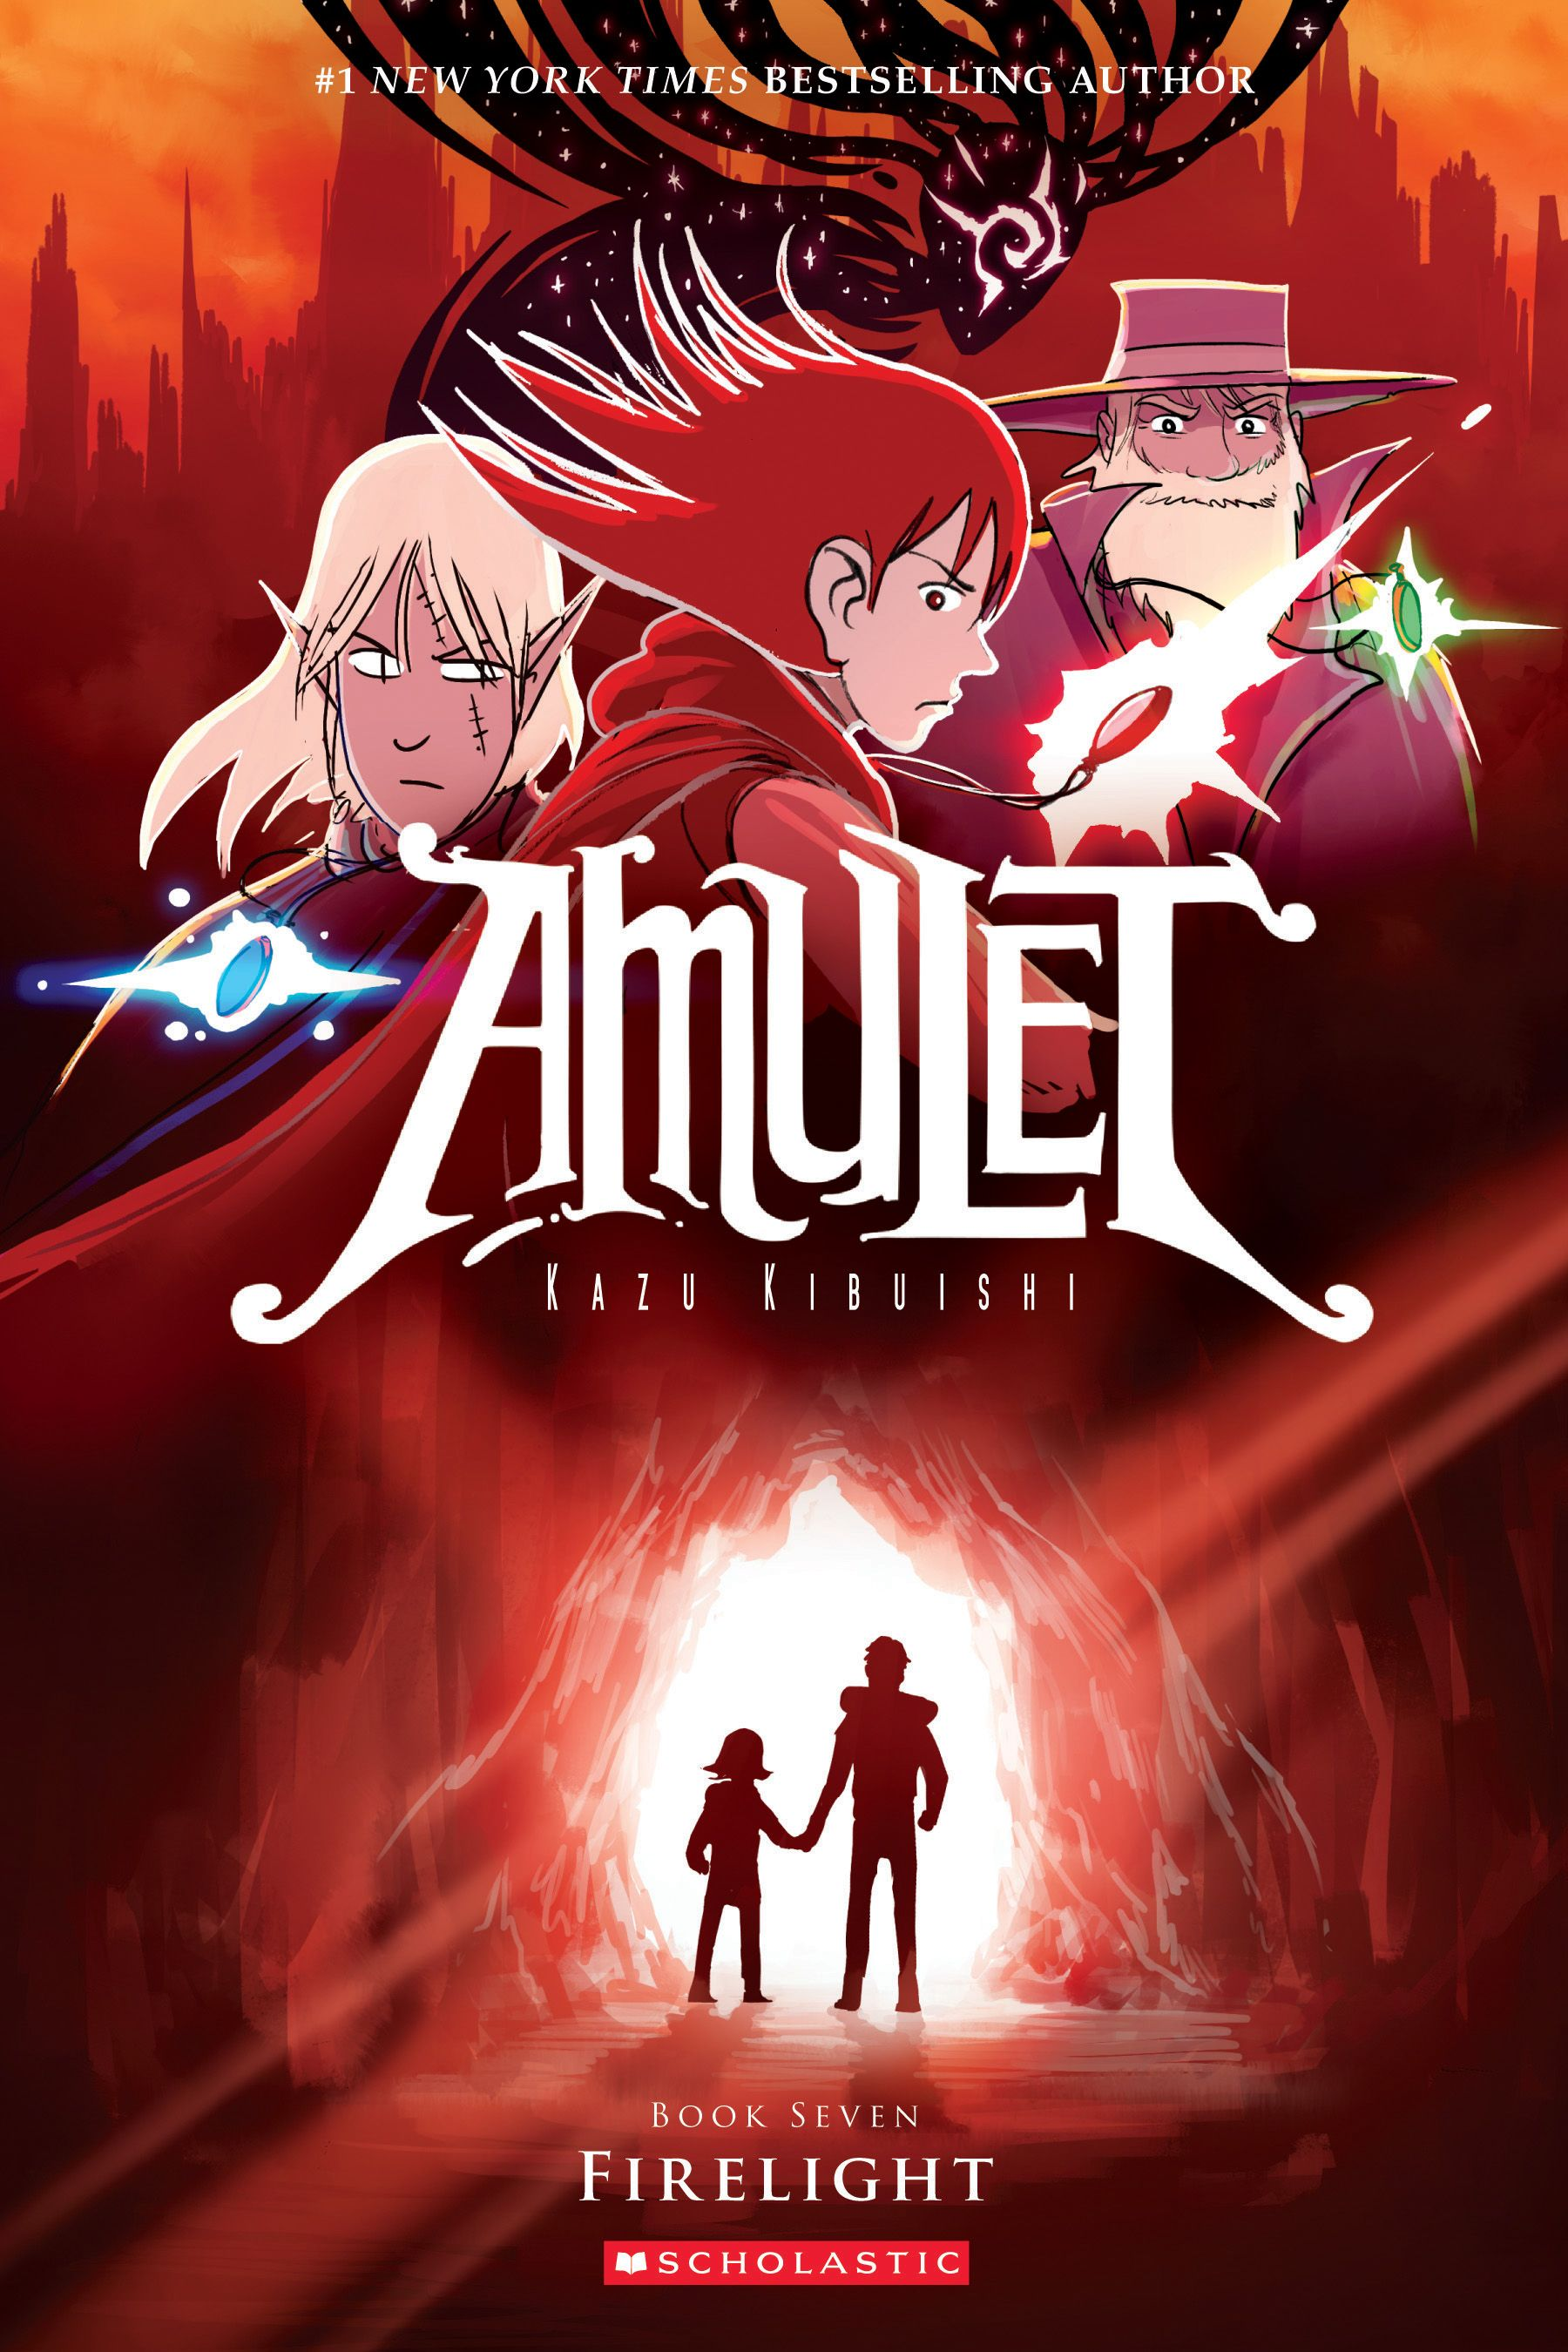 Amulet Book Seven: Firelight By Kazu Kibuishi